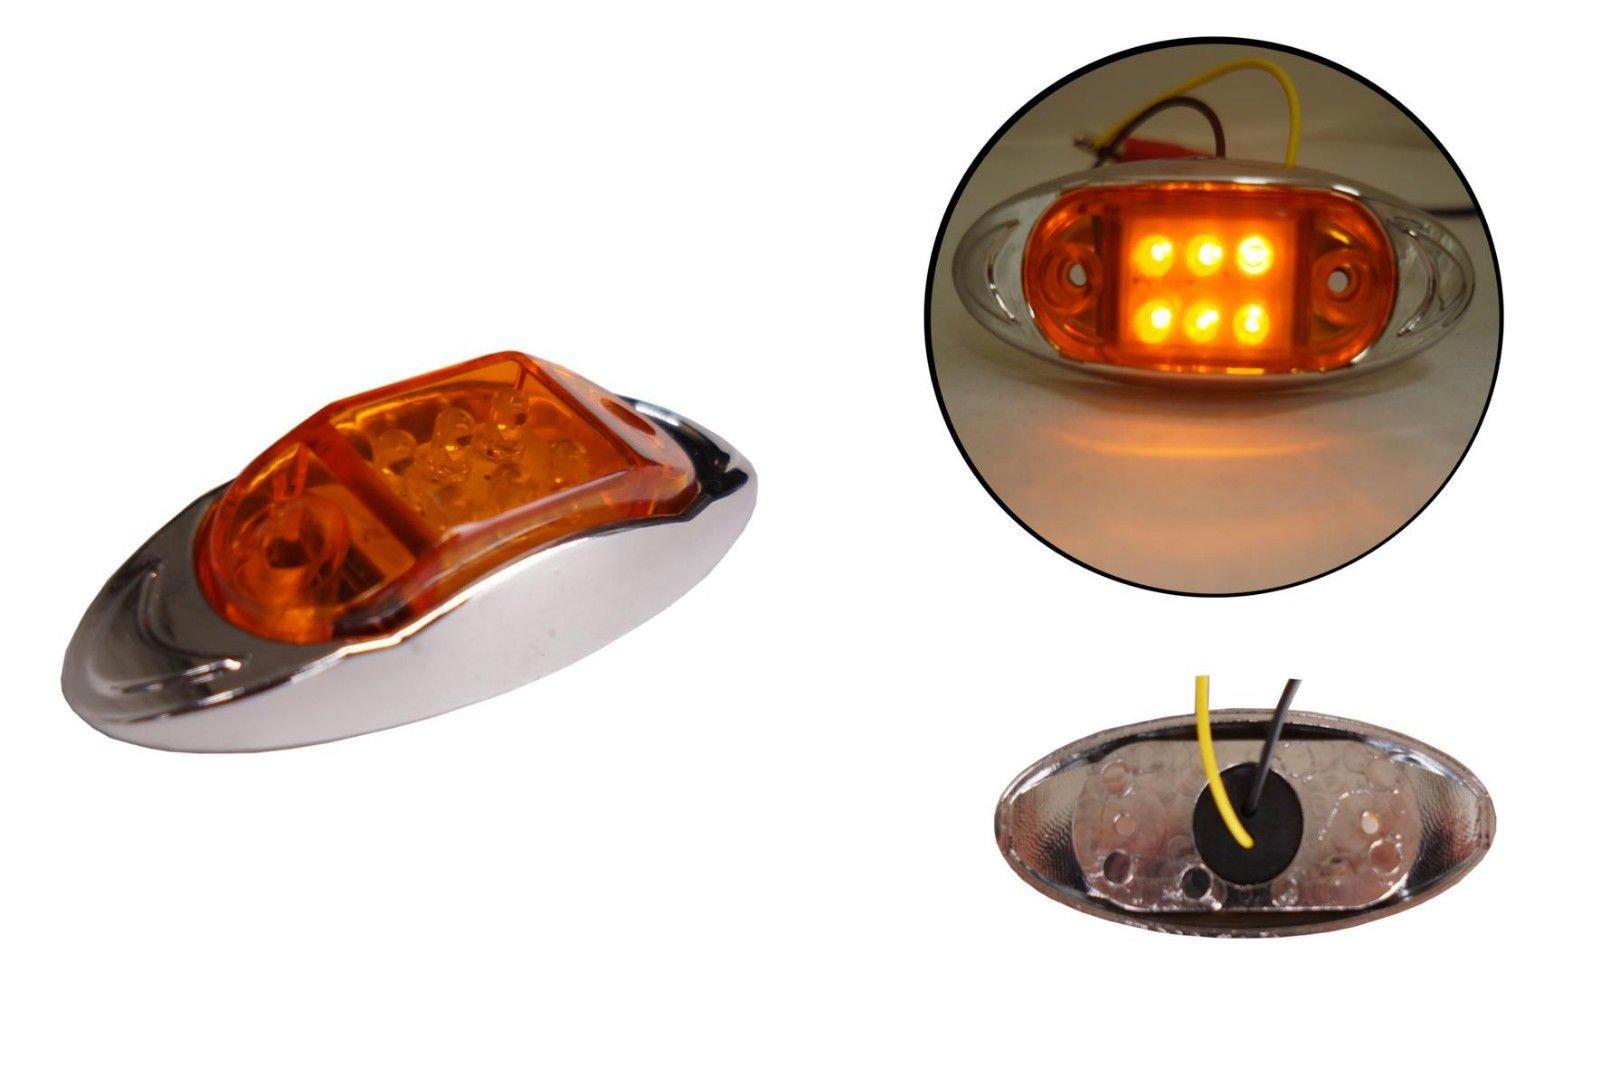 1x 12/24V 6LED lato posteriore anteriore cromata Marker Amber Orange Light Lamp rimorchio Horsebox Van